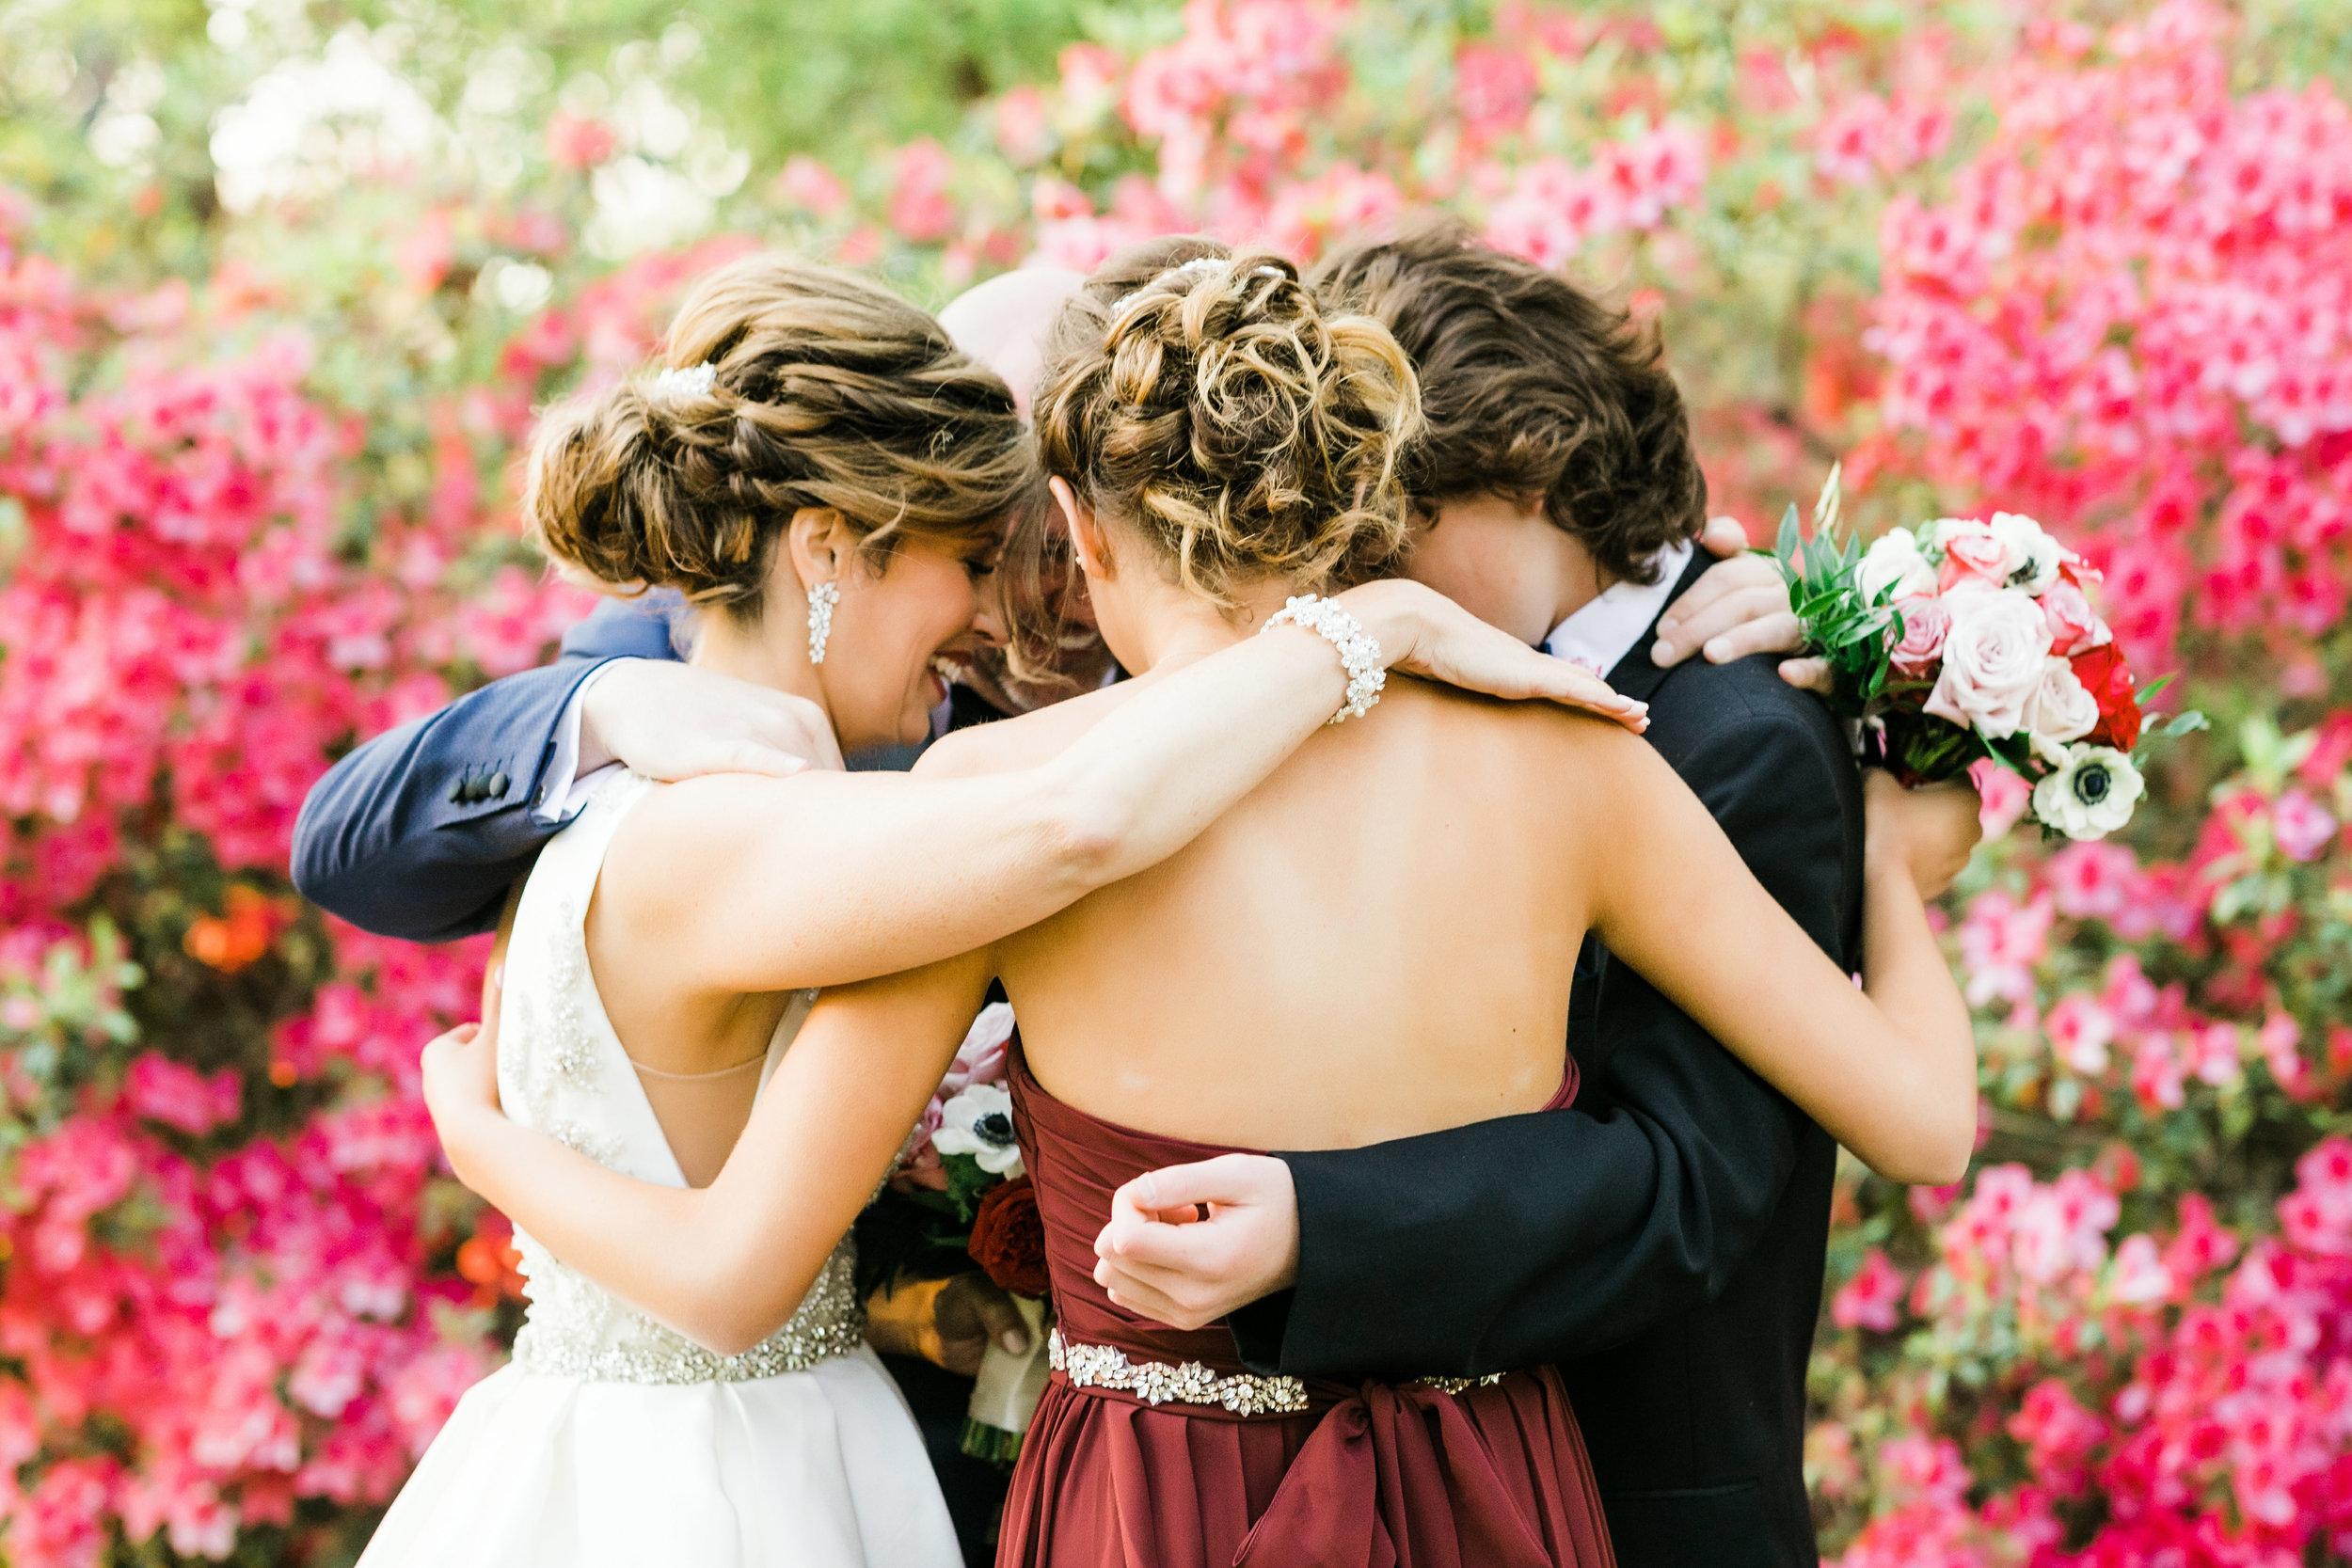 haehn-wedding-little-chapel-in-the-woods-denton-tx-lantana-golf-club-wedding-046.jpg